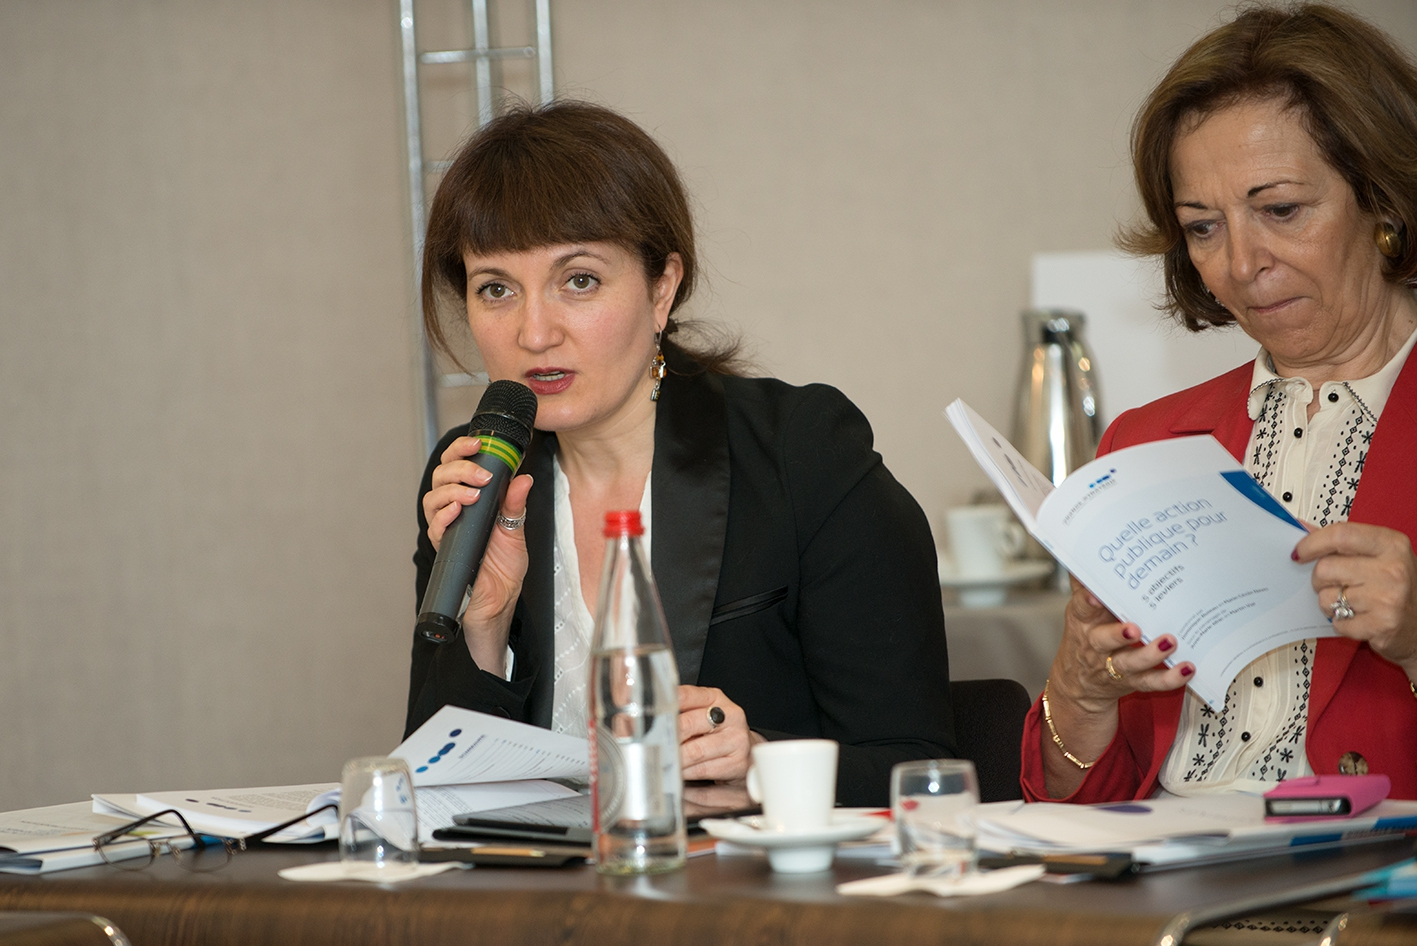 Marie-Cécile Naves, Anne-Marie Idrac